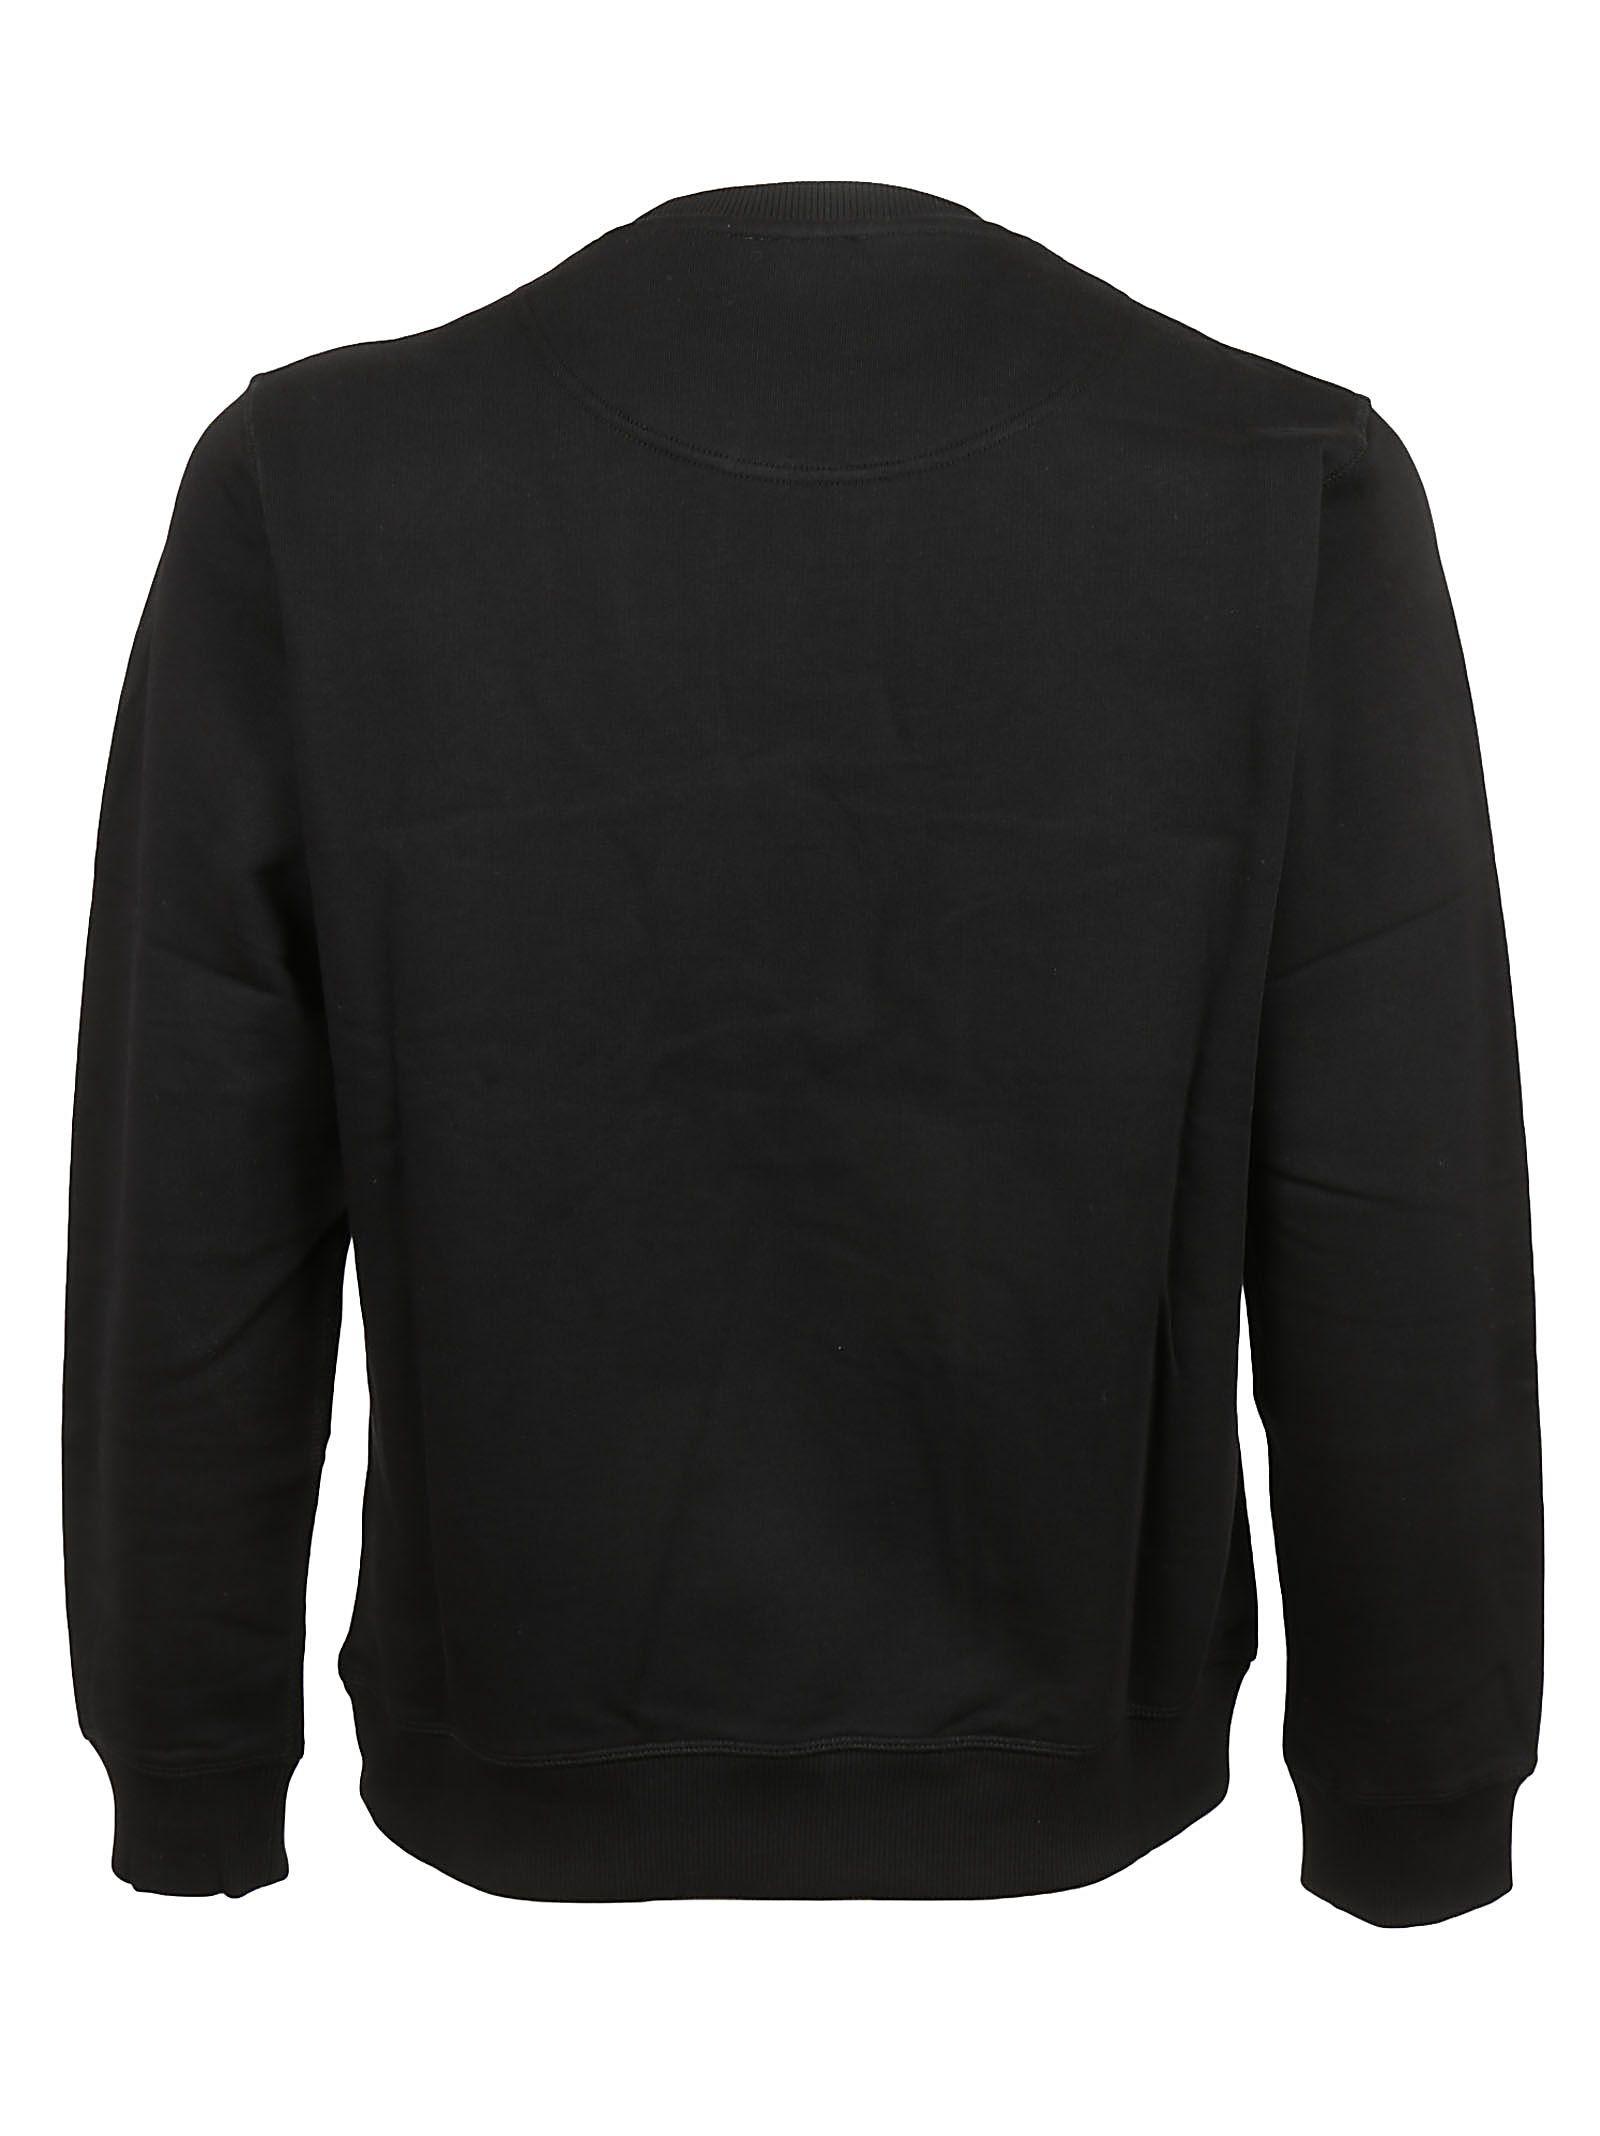 Black Kenzo Tiger Sweater